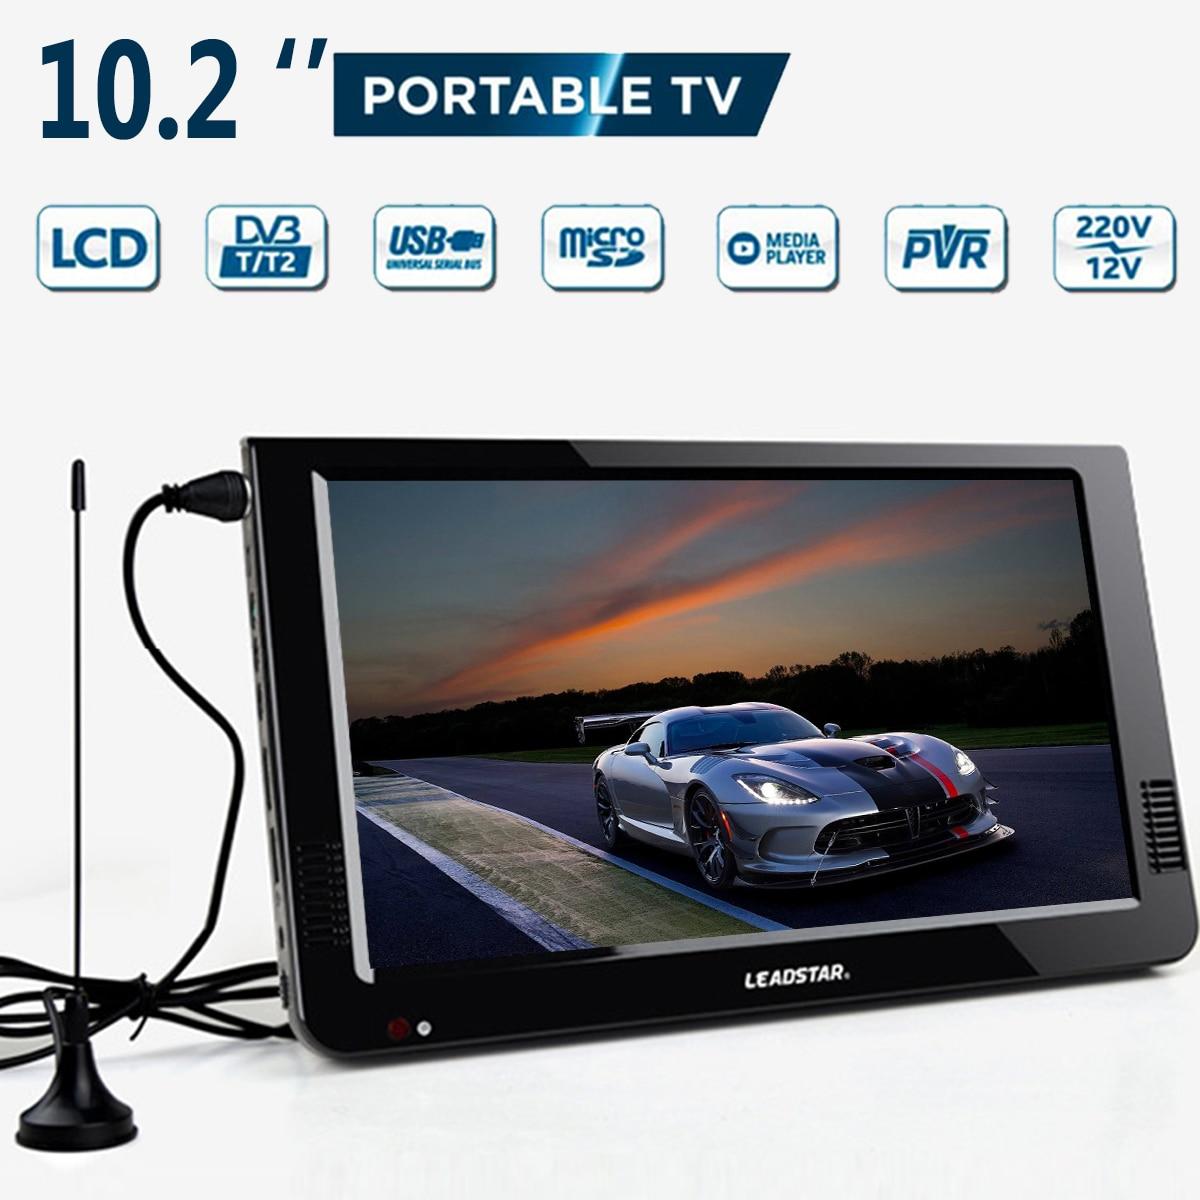 Al aire libre 10,2 pulgadas 12 V portátil Digital de televisión analógica DVB-T/DVB-T2 TFT LED HD TV soporte tarjeta TF USB audio del coche de televisión